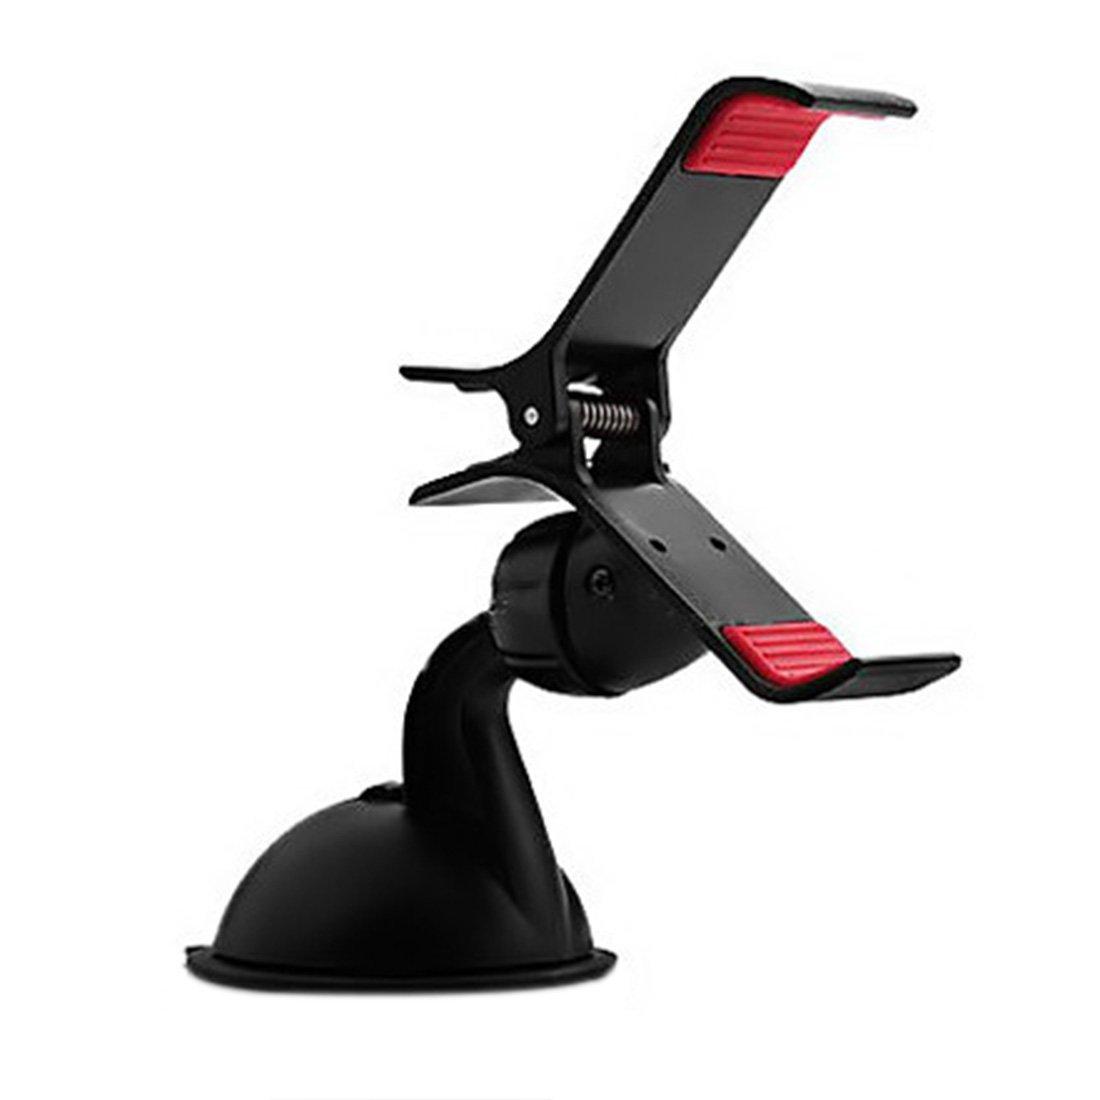 Windshield Mount Stand,Hmane 360°Rotation Universal Car Windshield Mount Stand Holder For Iphone 6/6 Plus Samsung Phone GPS - Black